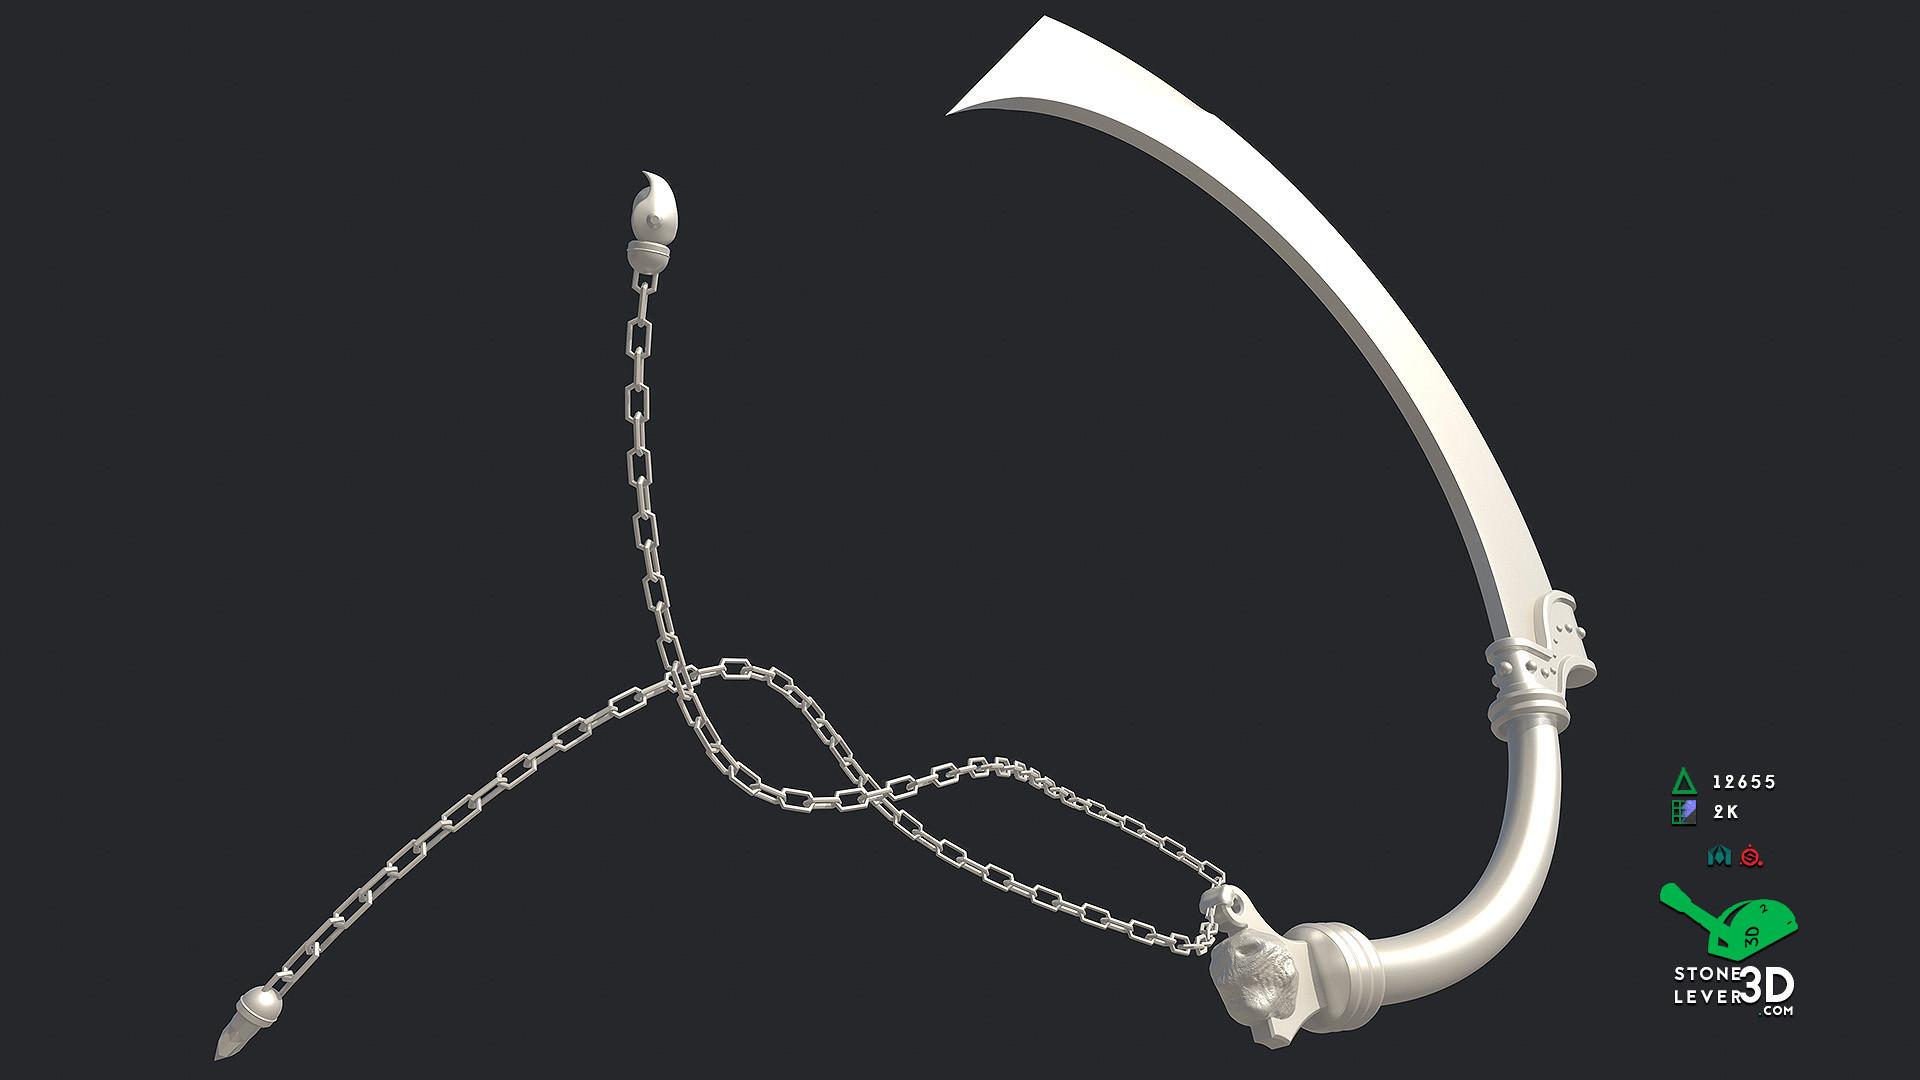 """J'Poki - Novacrusher"" - Sword Concept Prop Model - High Poly"